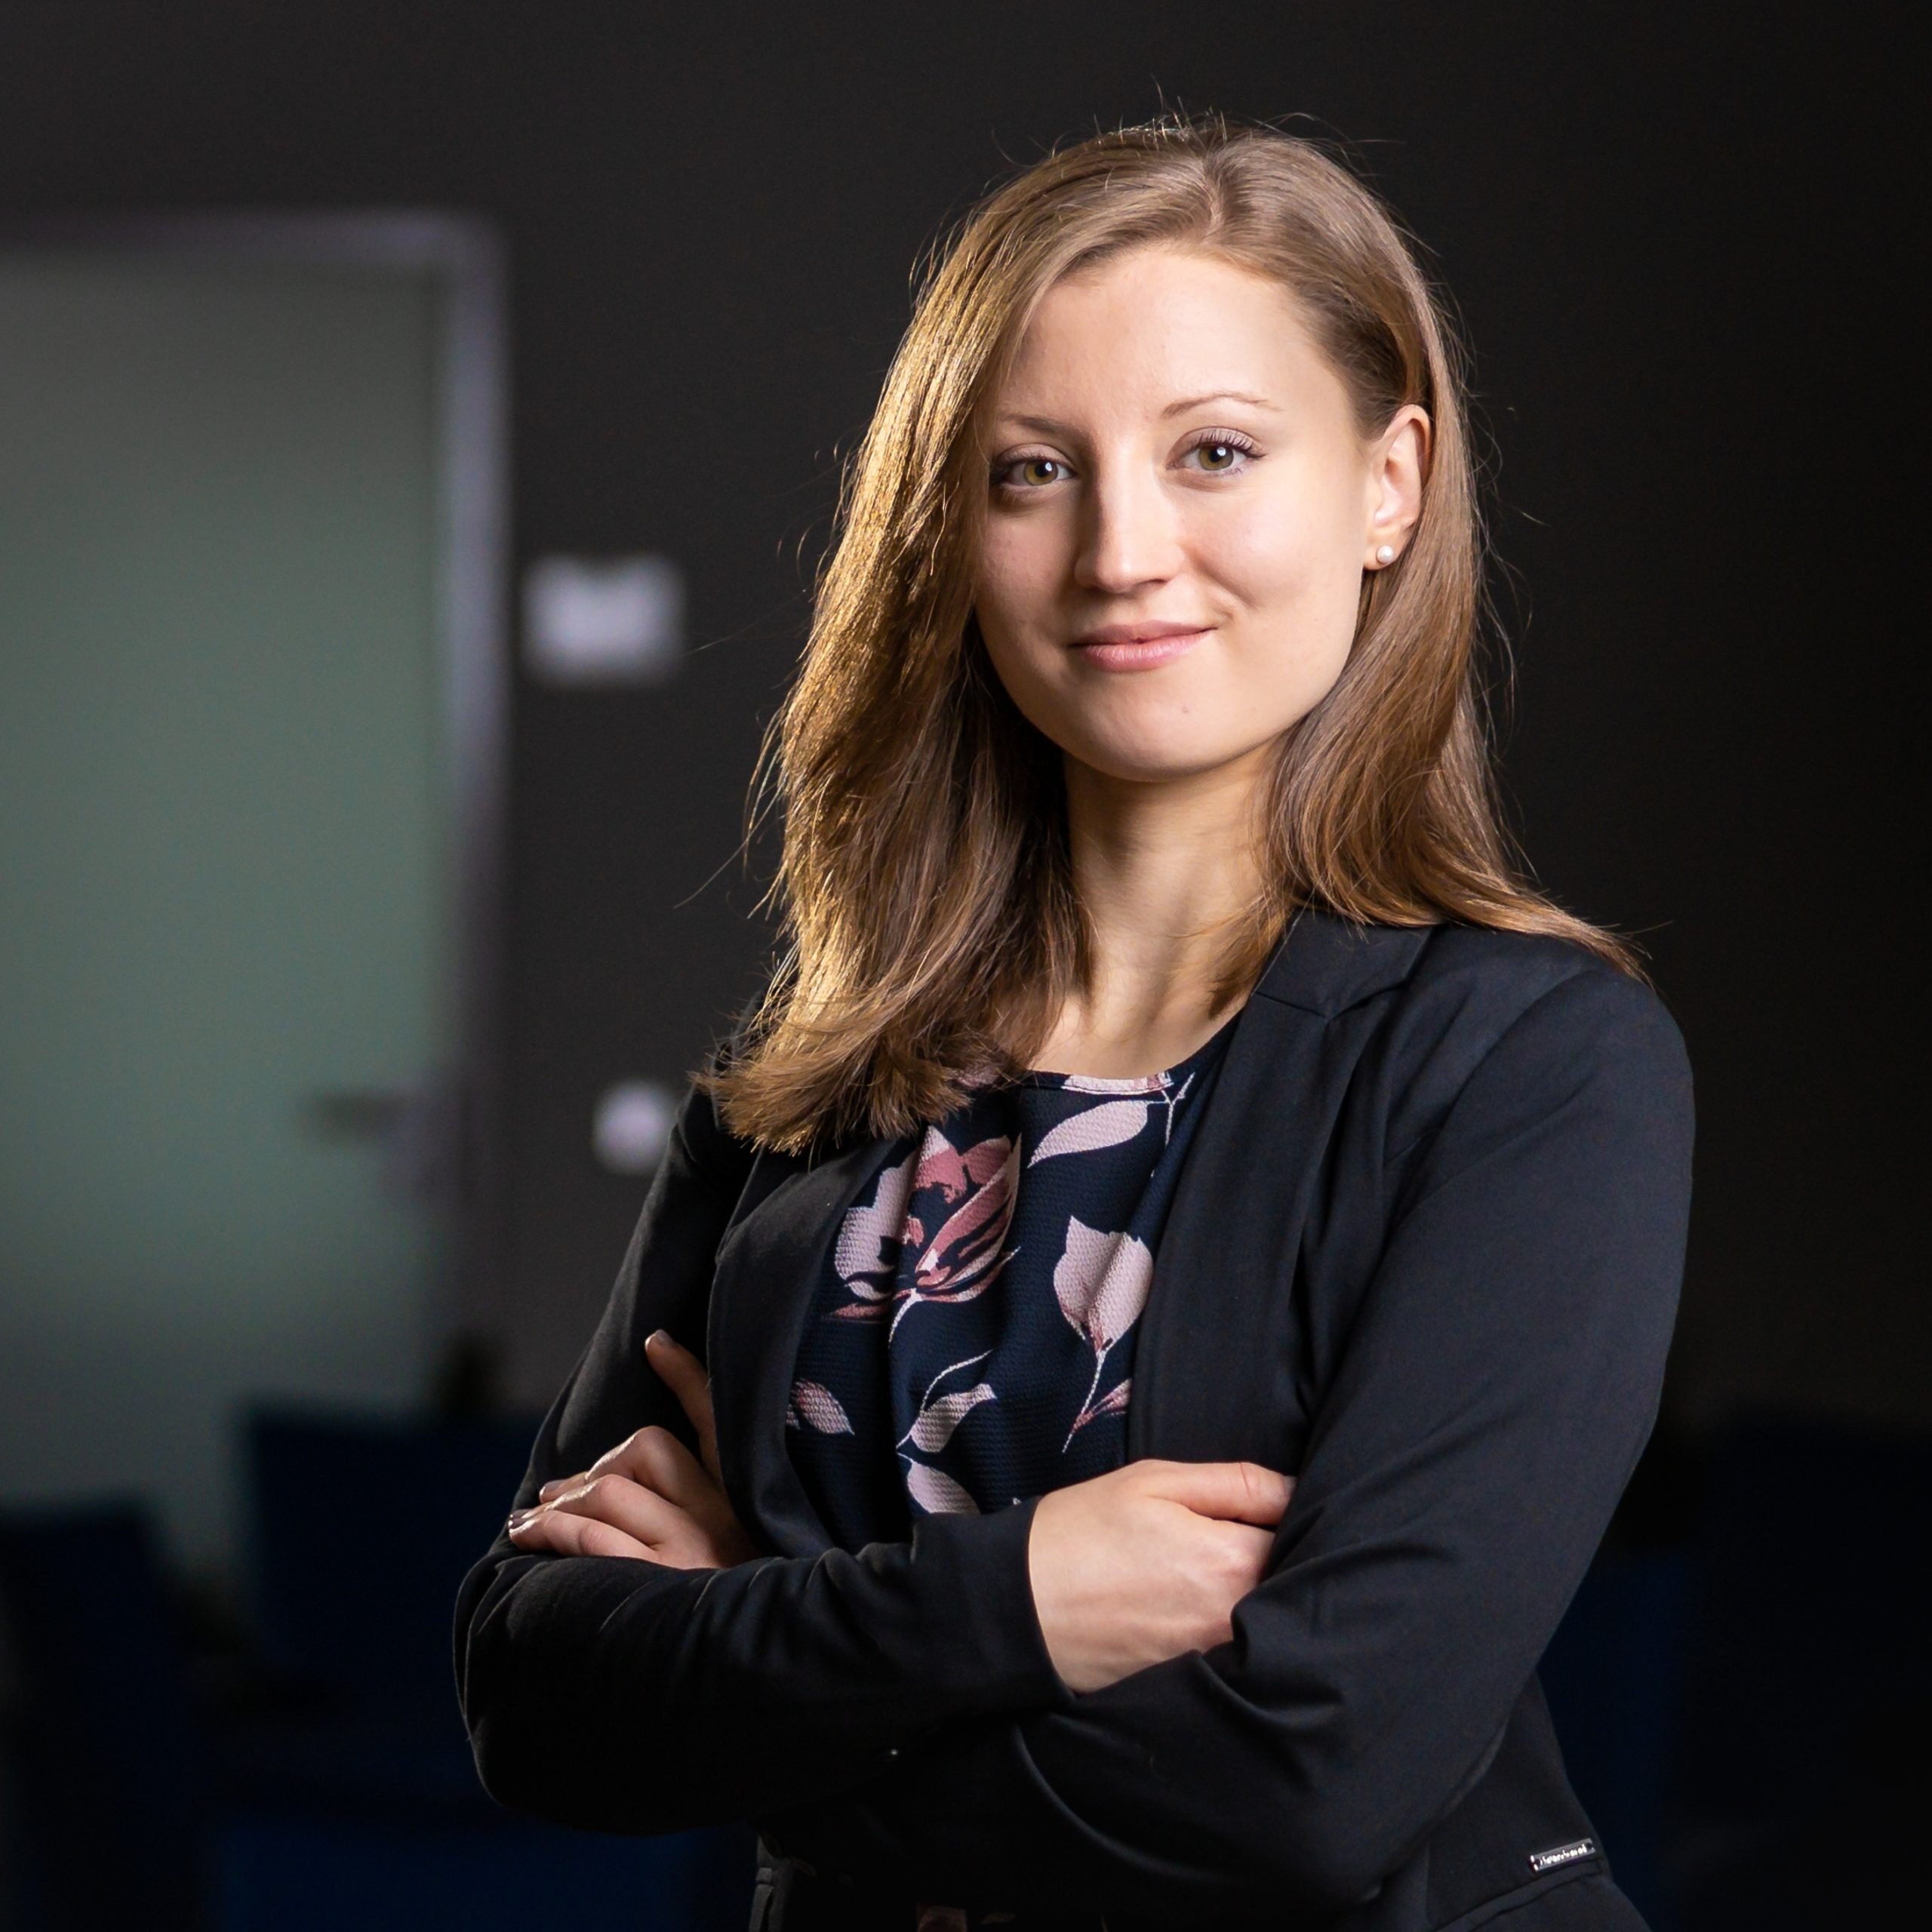 Nicole Selbmann